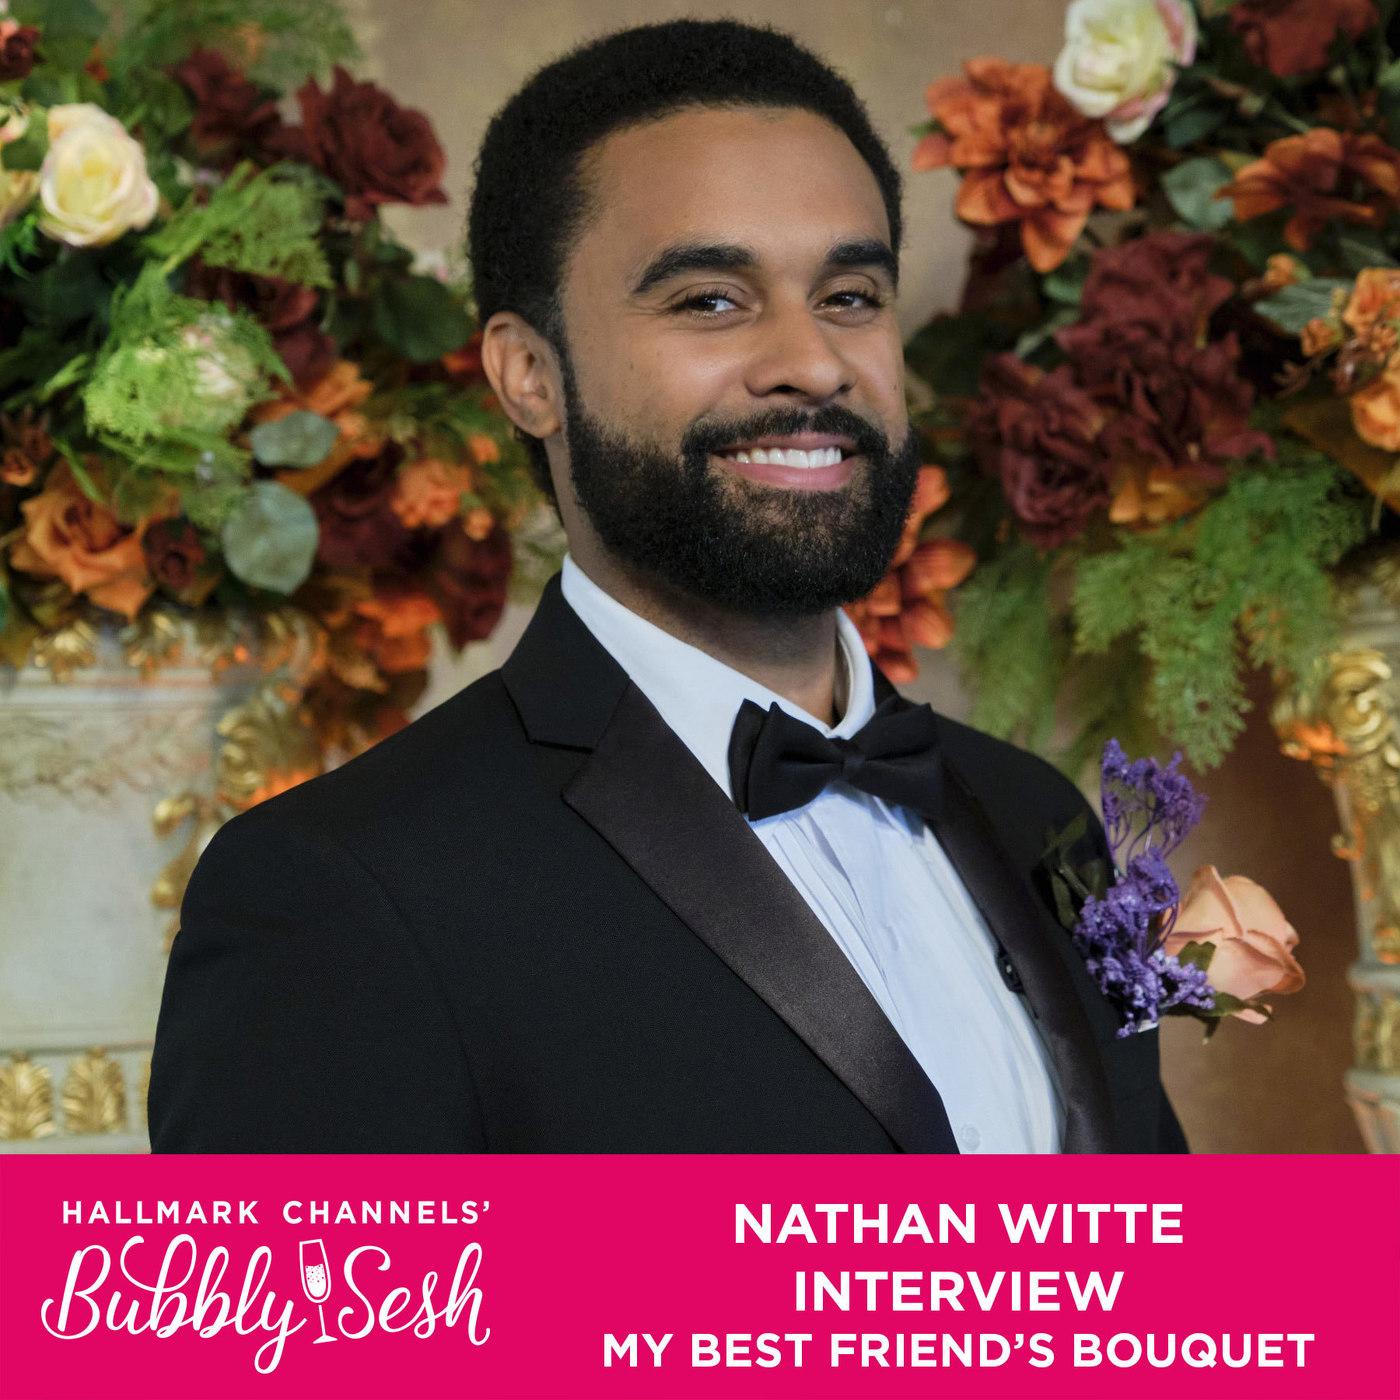 Nathan Witte Interview, My Best Friend's Bouquet